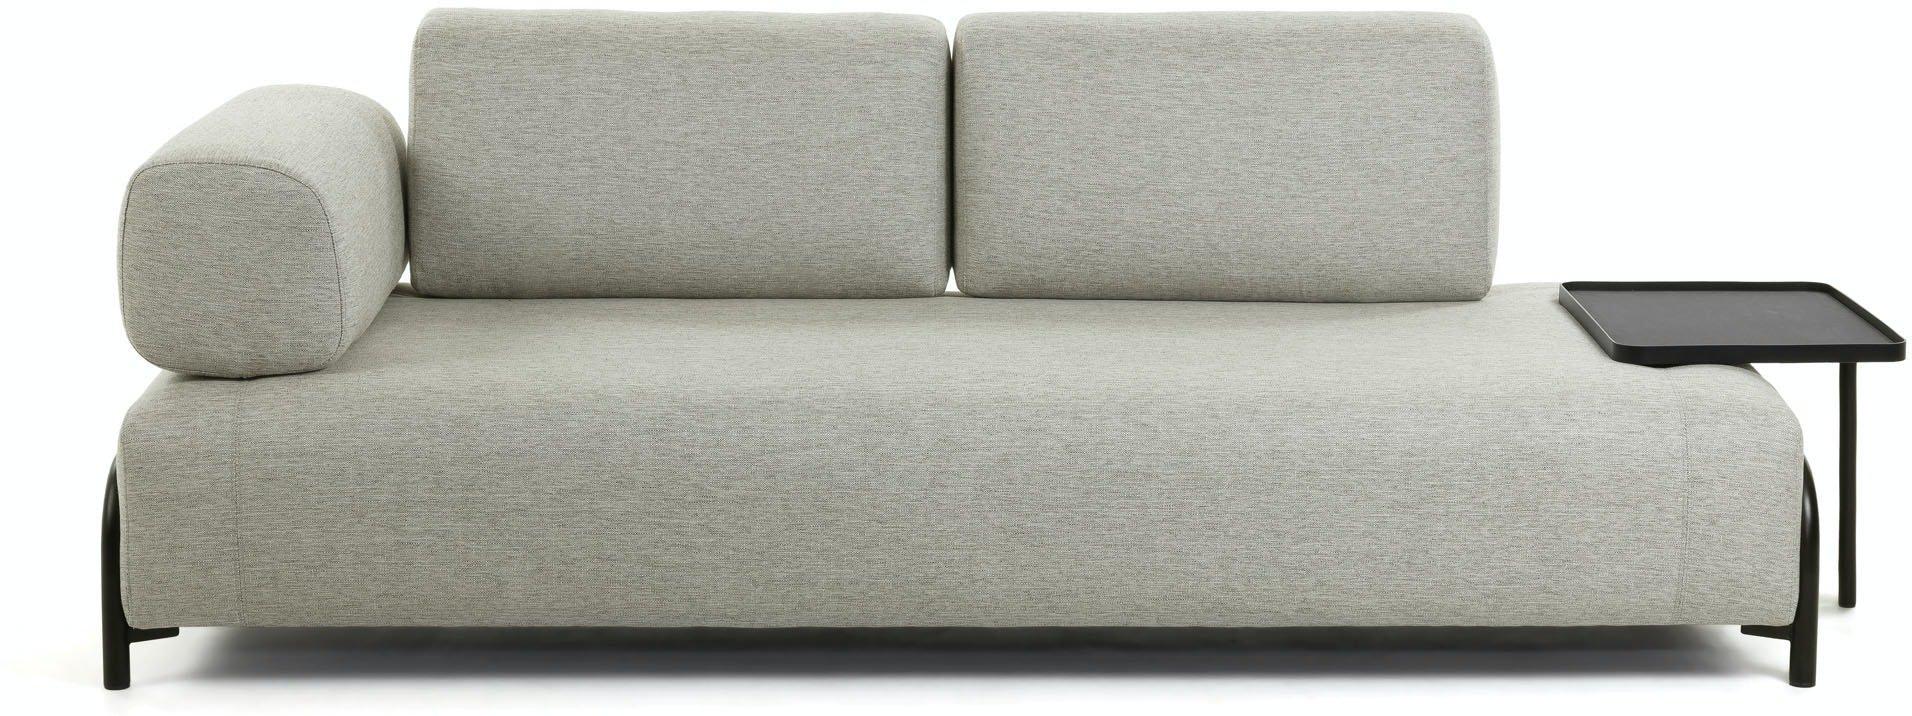 Compo, 3-personers sofa by LaForma (Armlæn venstre, Beige)